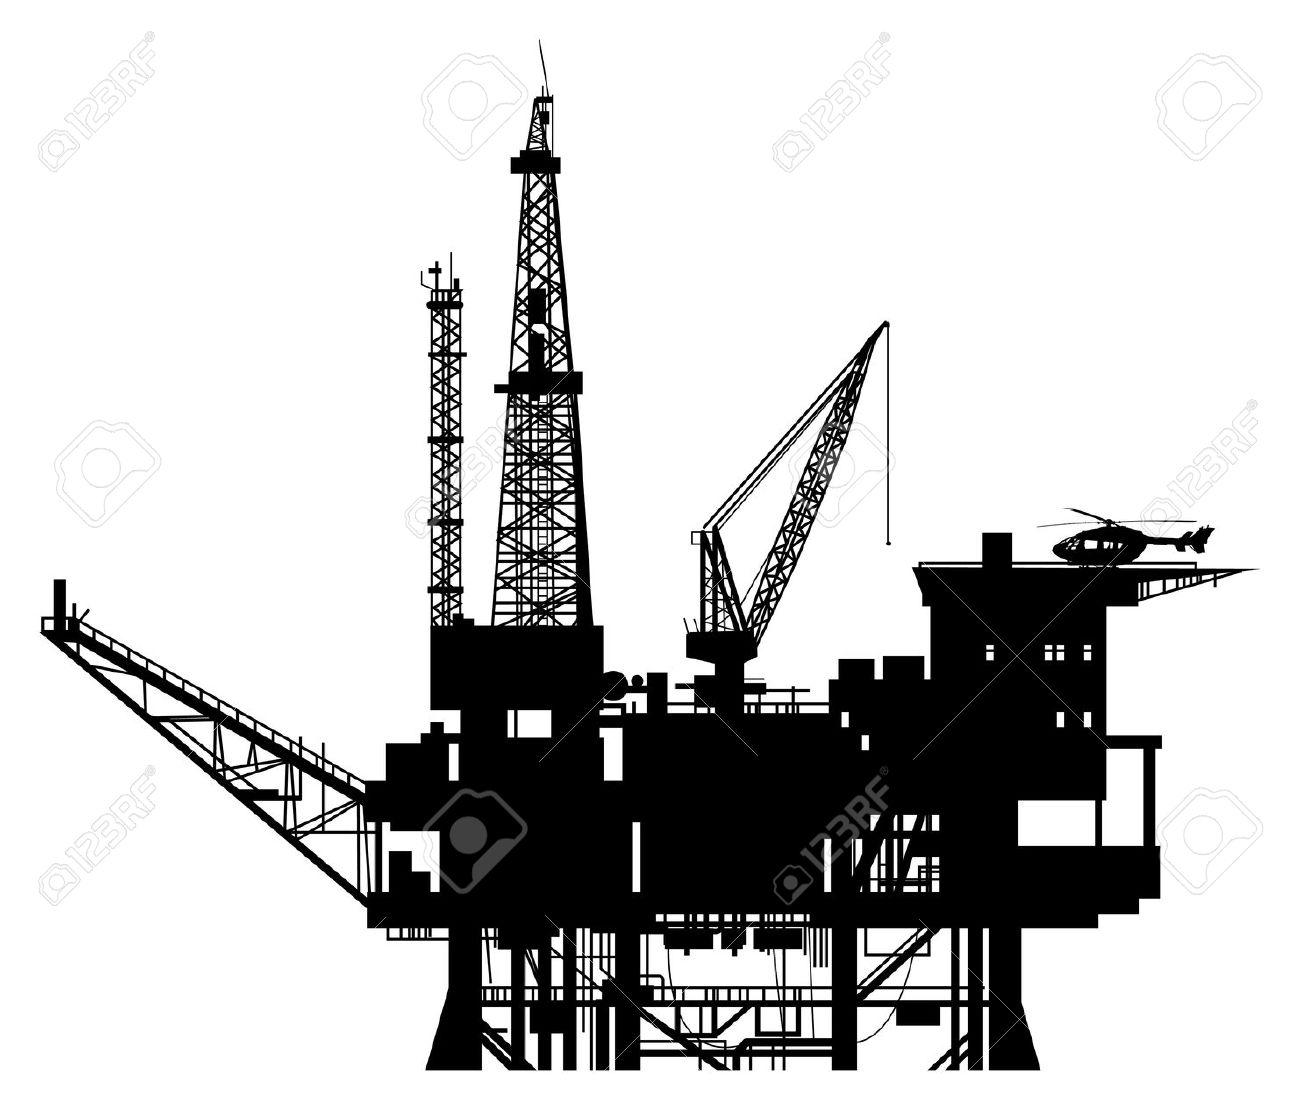 rig clipartlook. Oil clipart oil platform